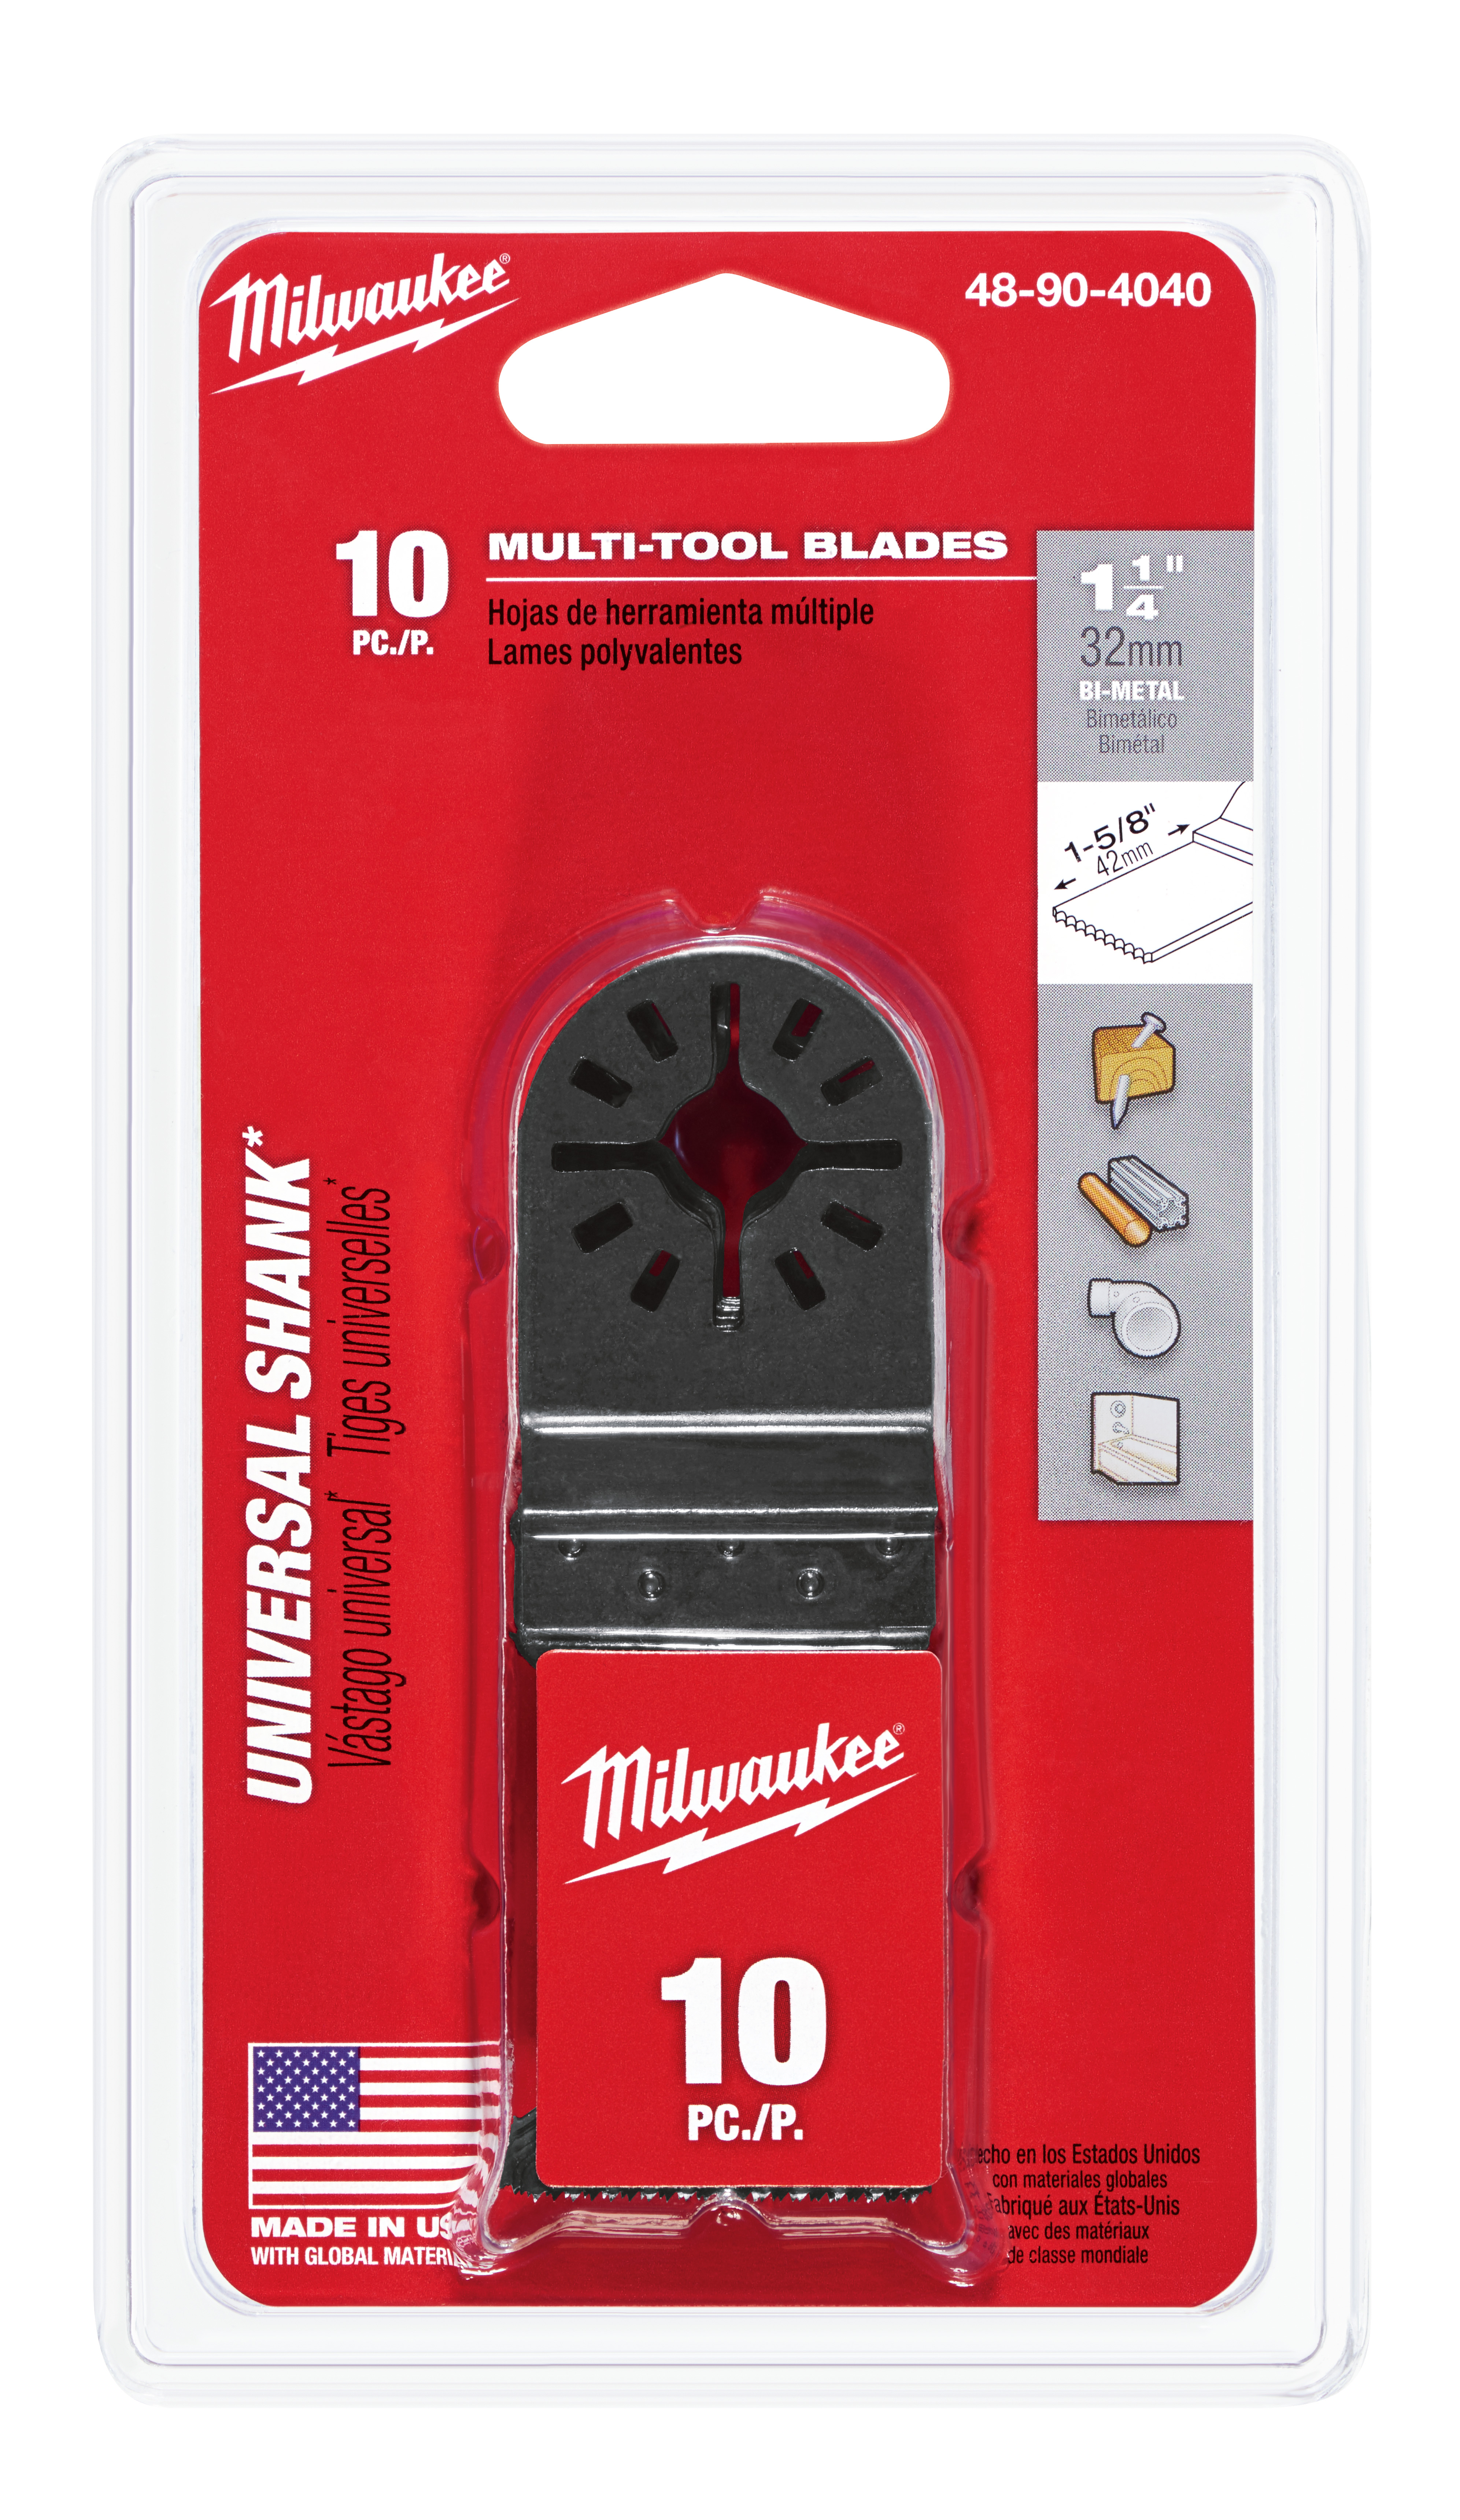 Milwaukee® 48-90-4040 Multi-Tool Blade With Universal Shank, For Use With Milwaukee®, Bosch® (Non-Starlock™), SKIL®, Makita®, Craftsman®, Fein® (Non-Starlock™), Ridgid®, AEG®, Ozito® and Ryobi® Professional Grade Oscillating Multi-Tool, 1-1/4 in, Bi-Metal